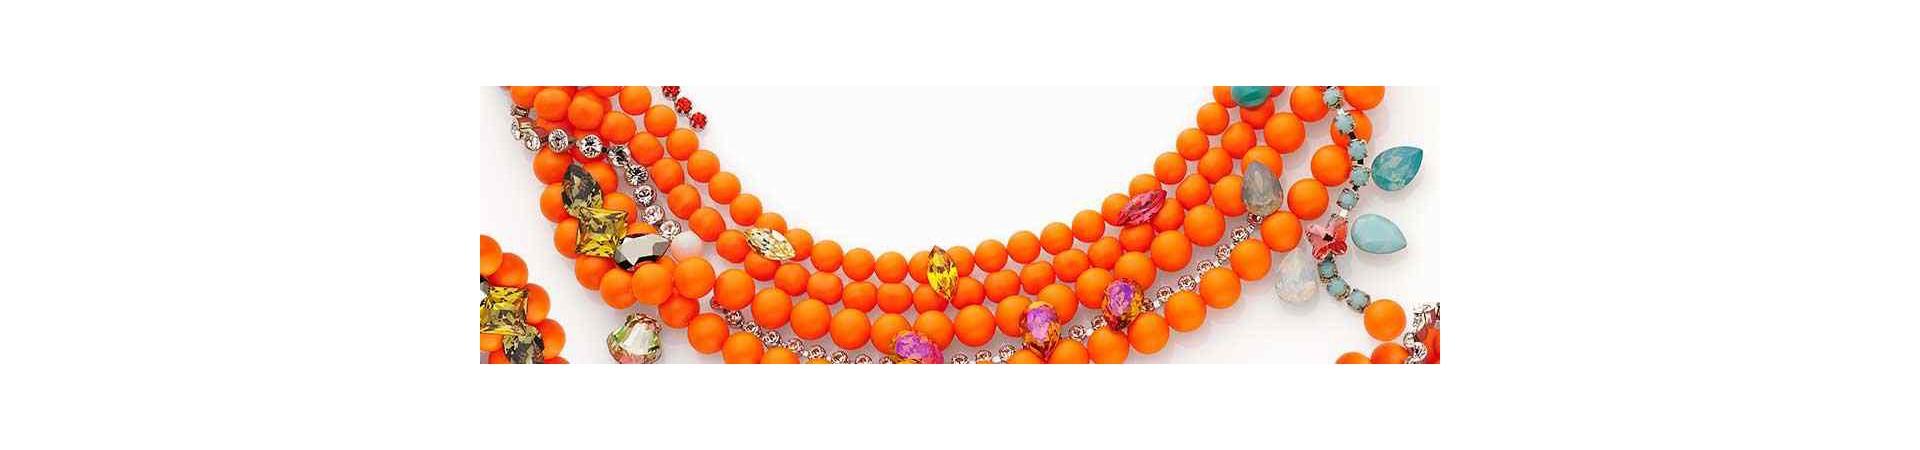 Crystal Pearls Swarovski Elements